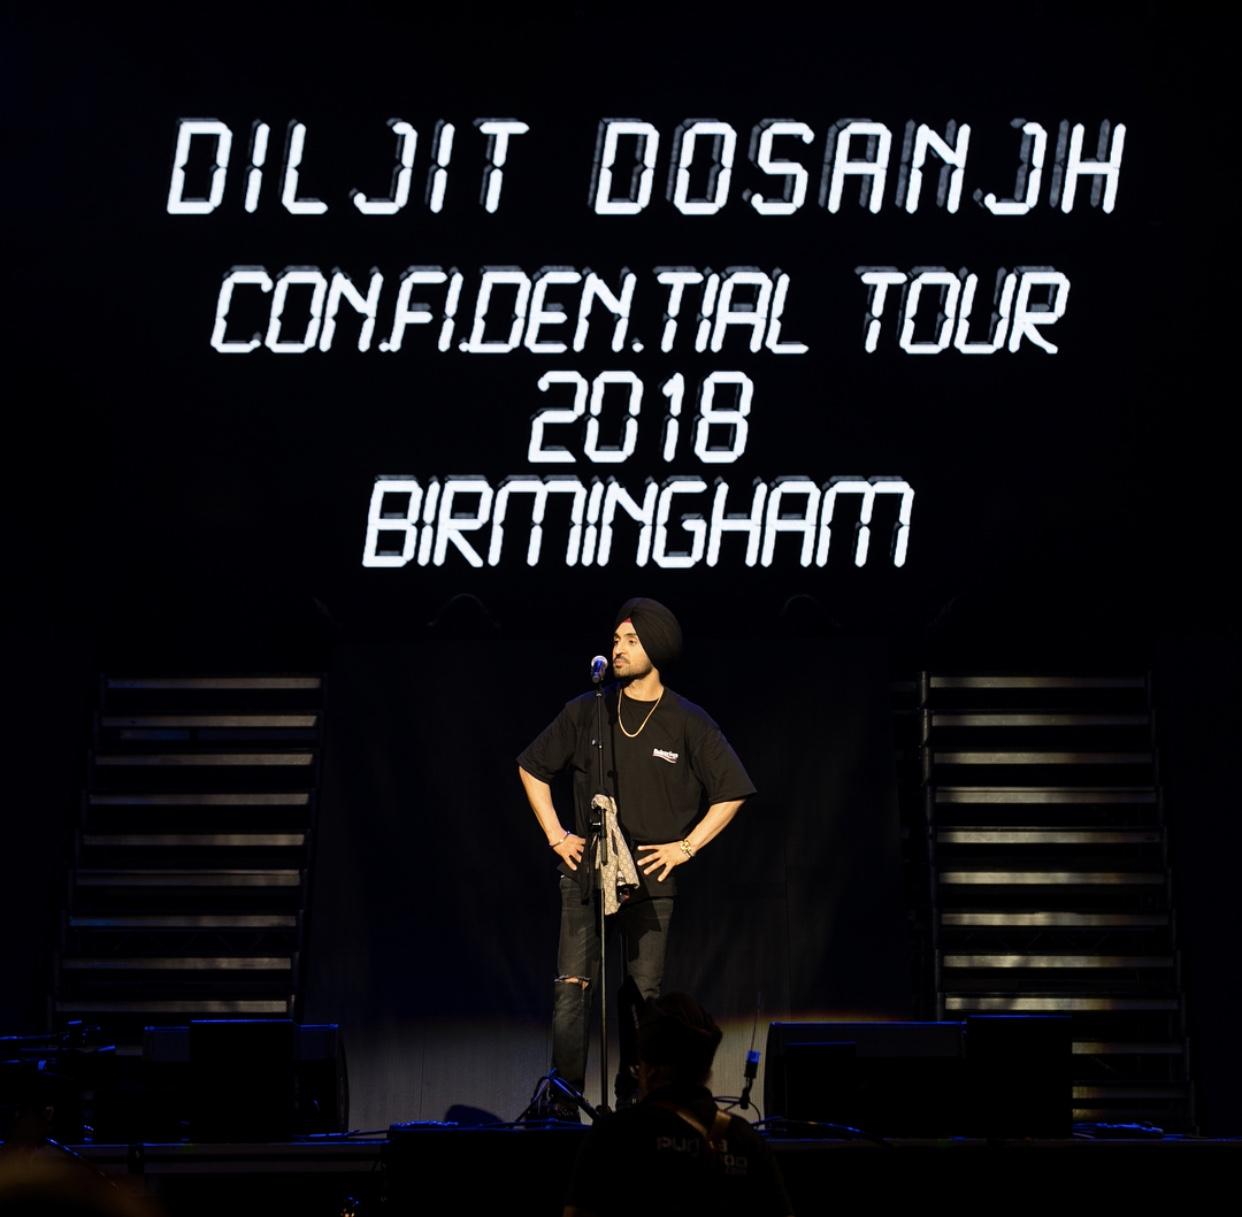 DILJIT DOSANJH BREAKS BOX OFFICE RECORD AT ARENA BIRMINGHAM